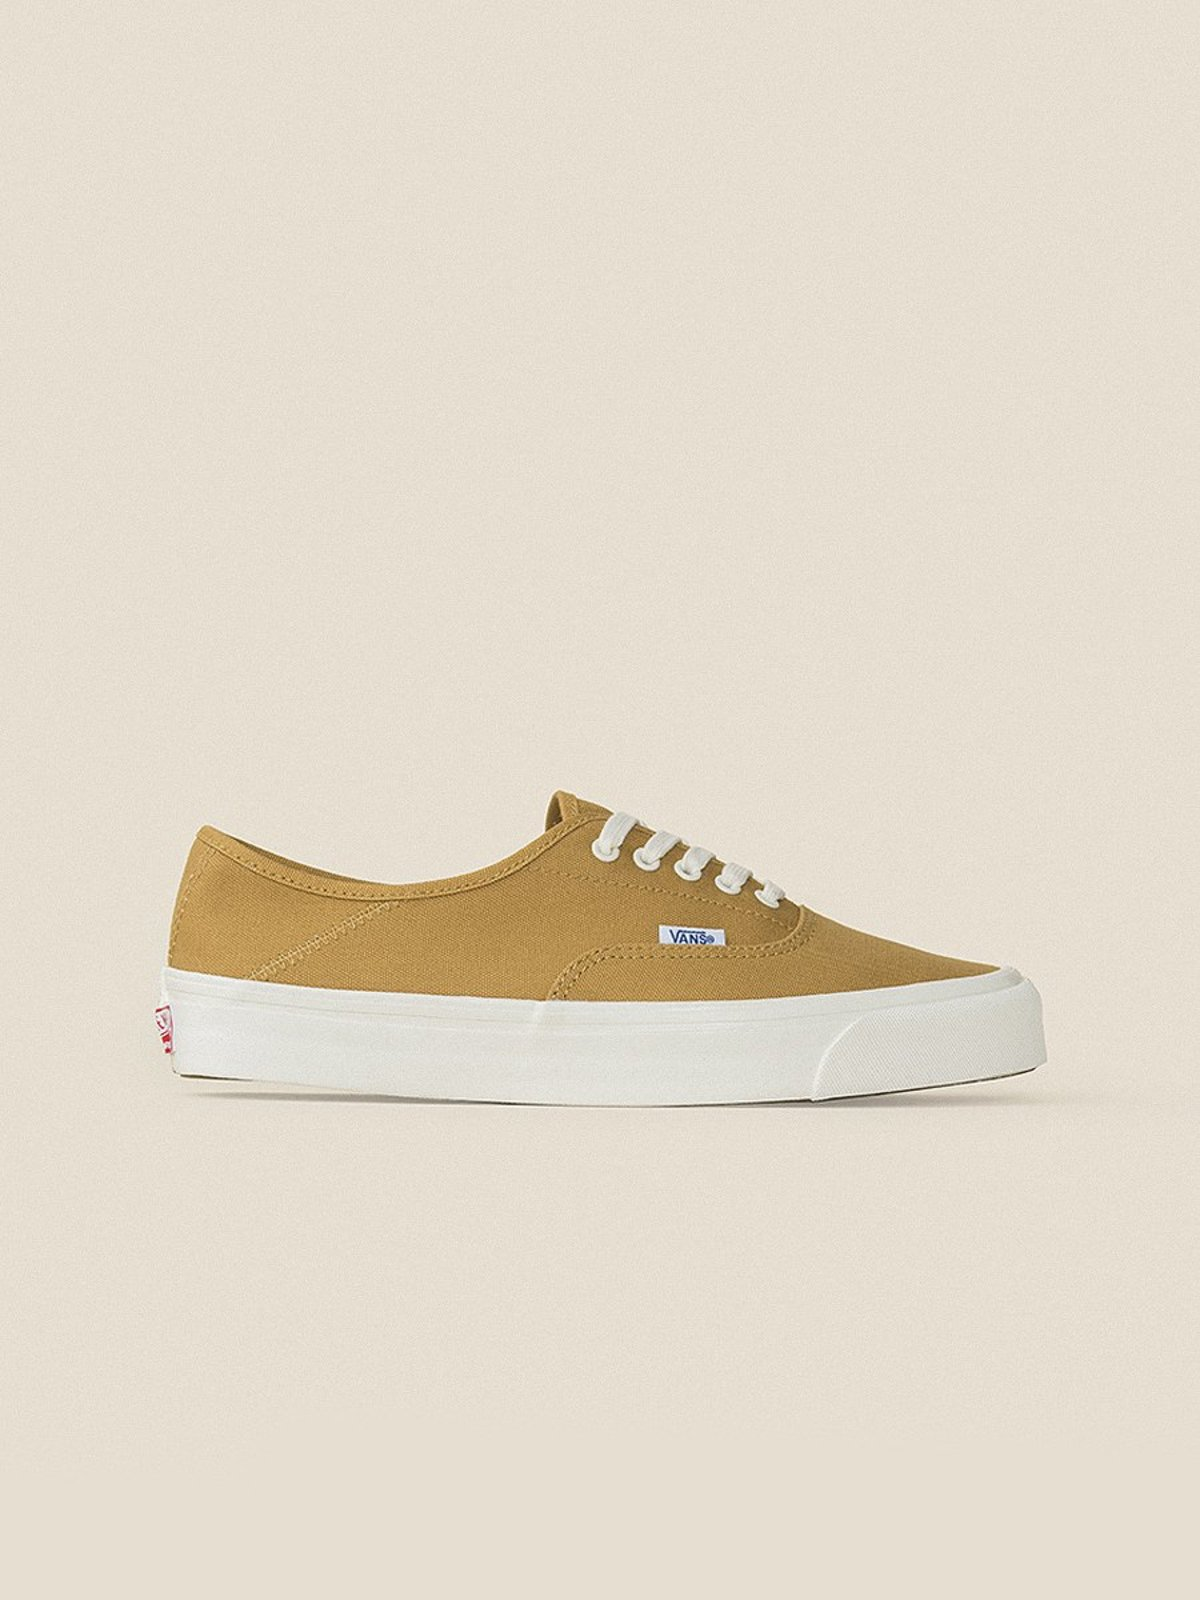 VANS-VAULT-OG-Style-43-LX--Canvas--Honey-Mustard-Marshmallow-20180531220121.jpg